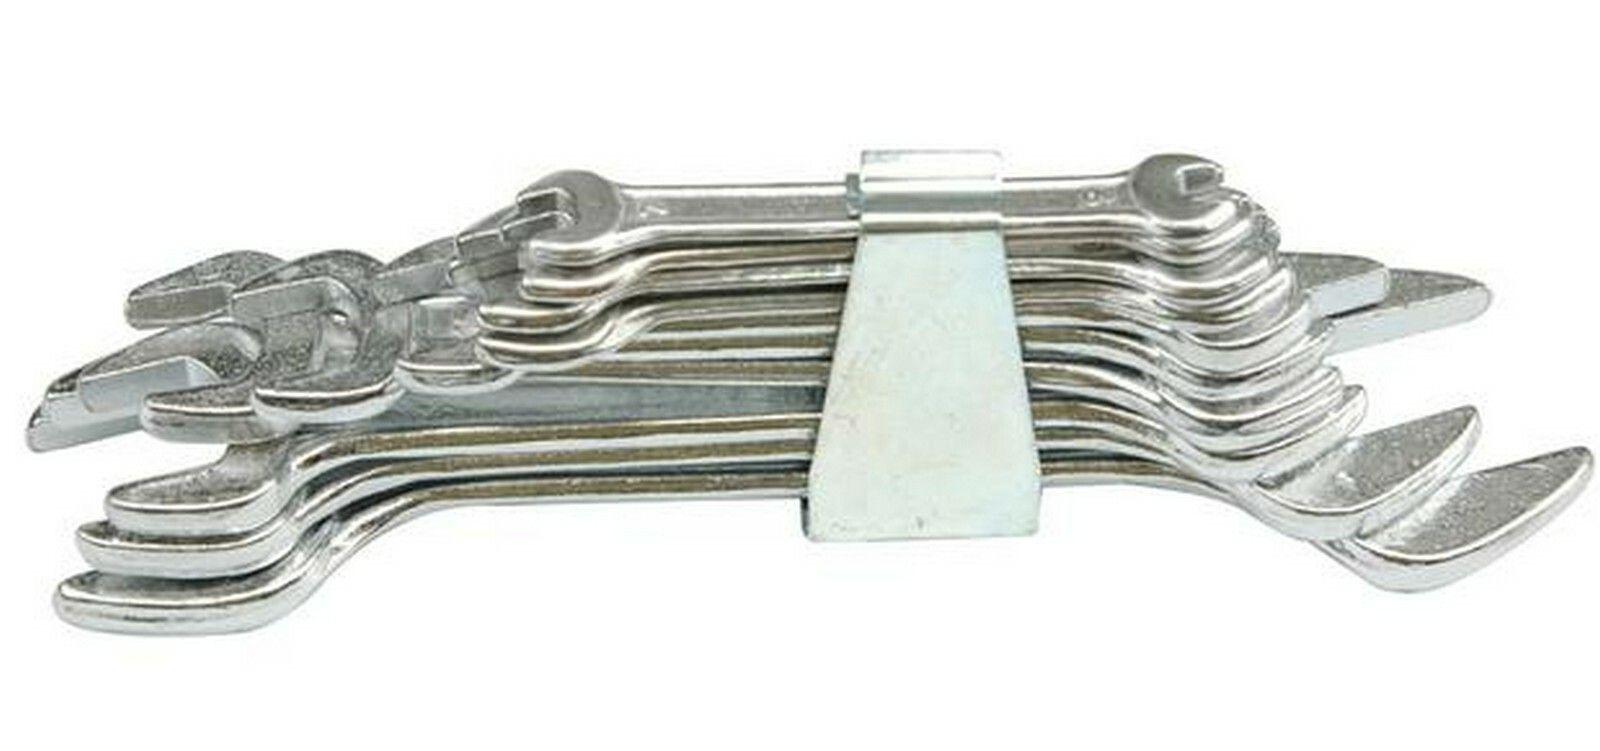 Sada klíčů plochých 8 ks 6 - 22 mm spona TOYA